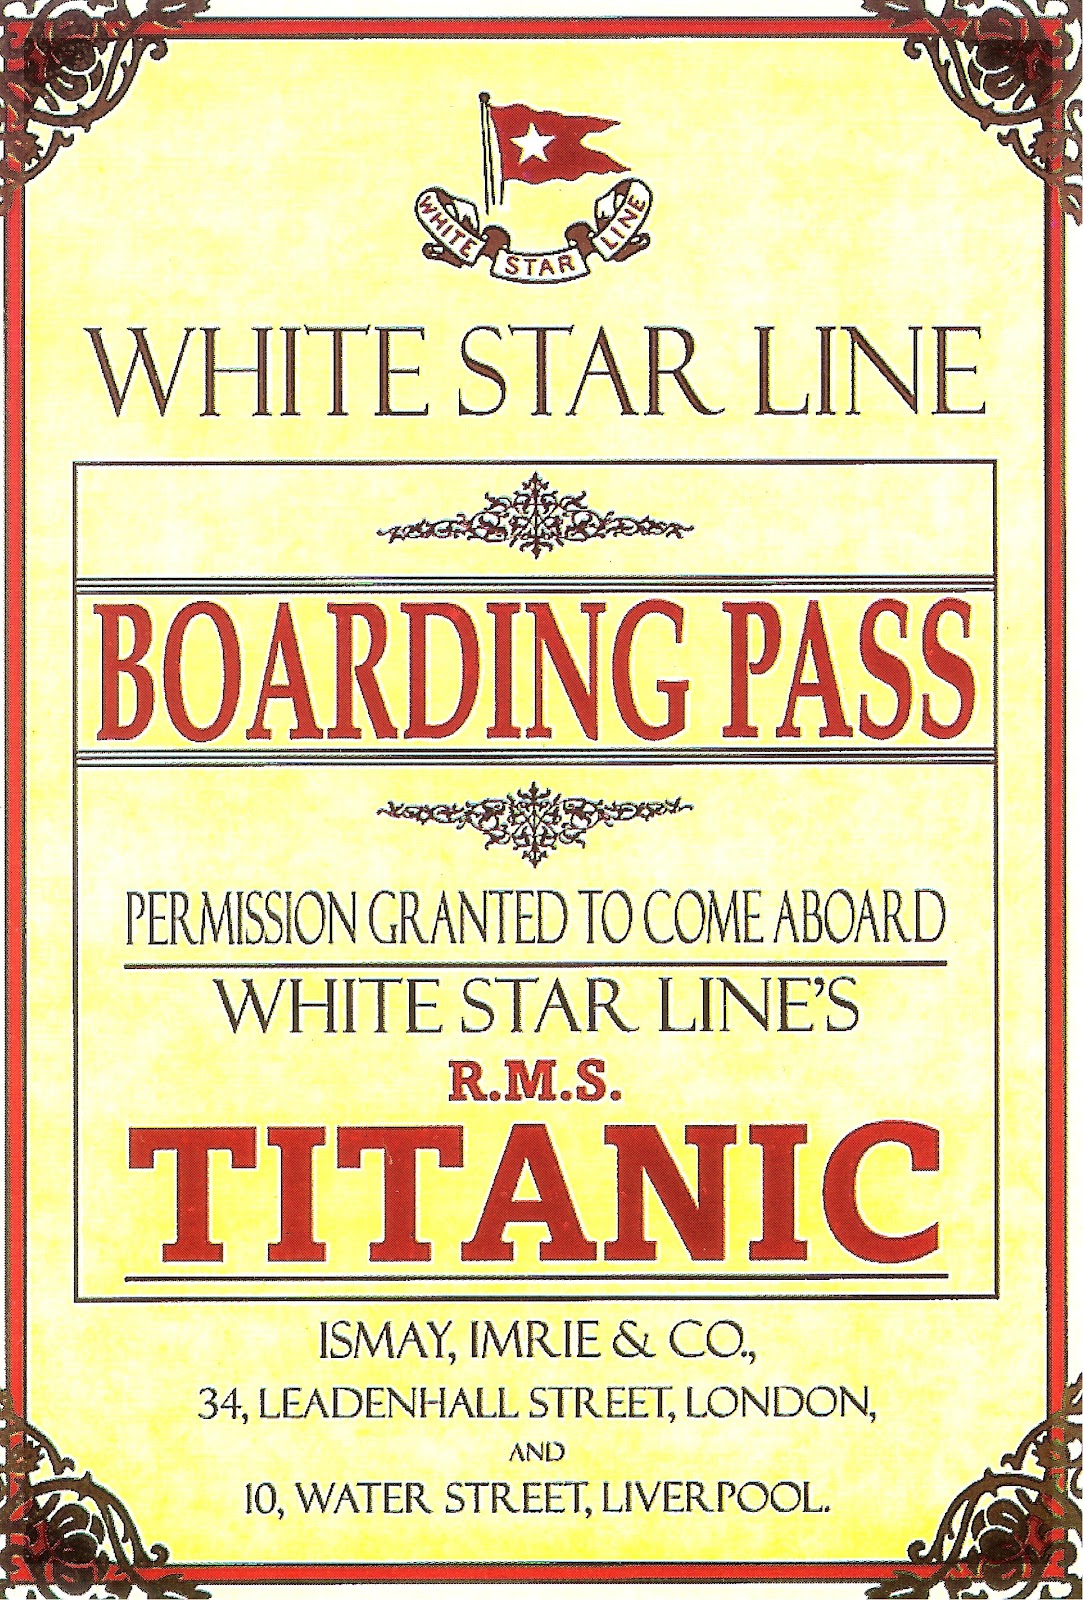 Relevant Tea Leaf Last Dinner On The Titanic Boarding Pass